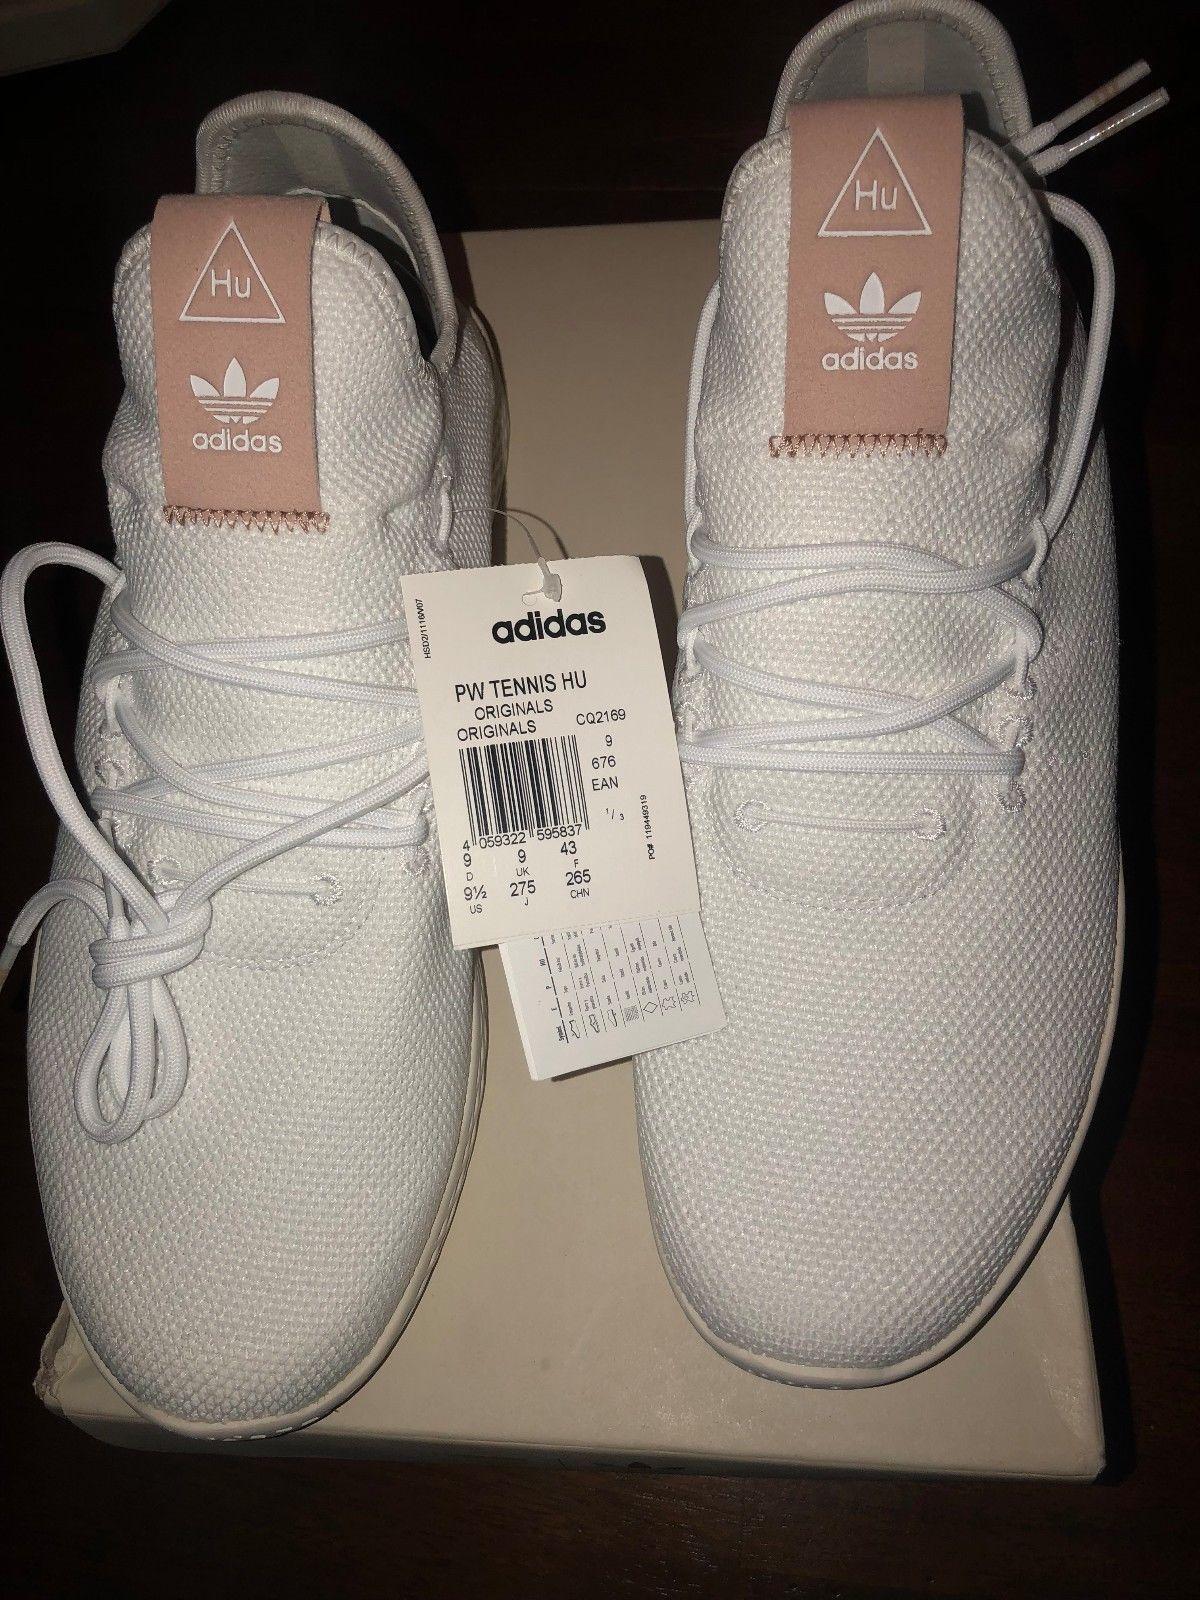 adidas pw tennis hu sale